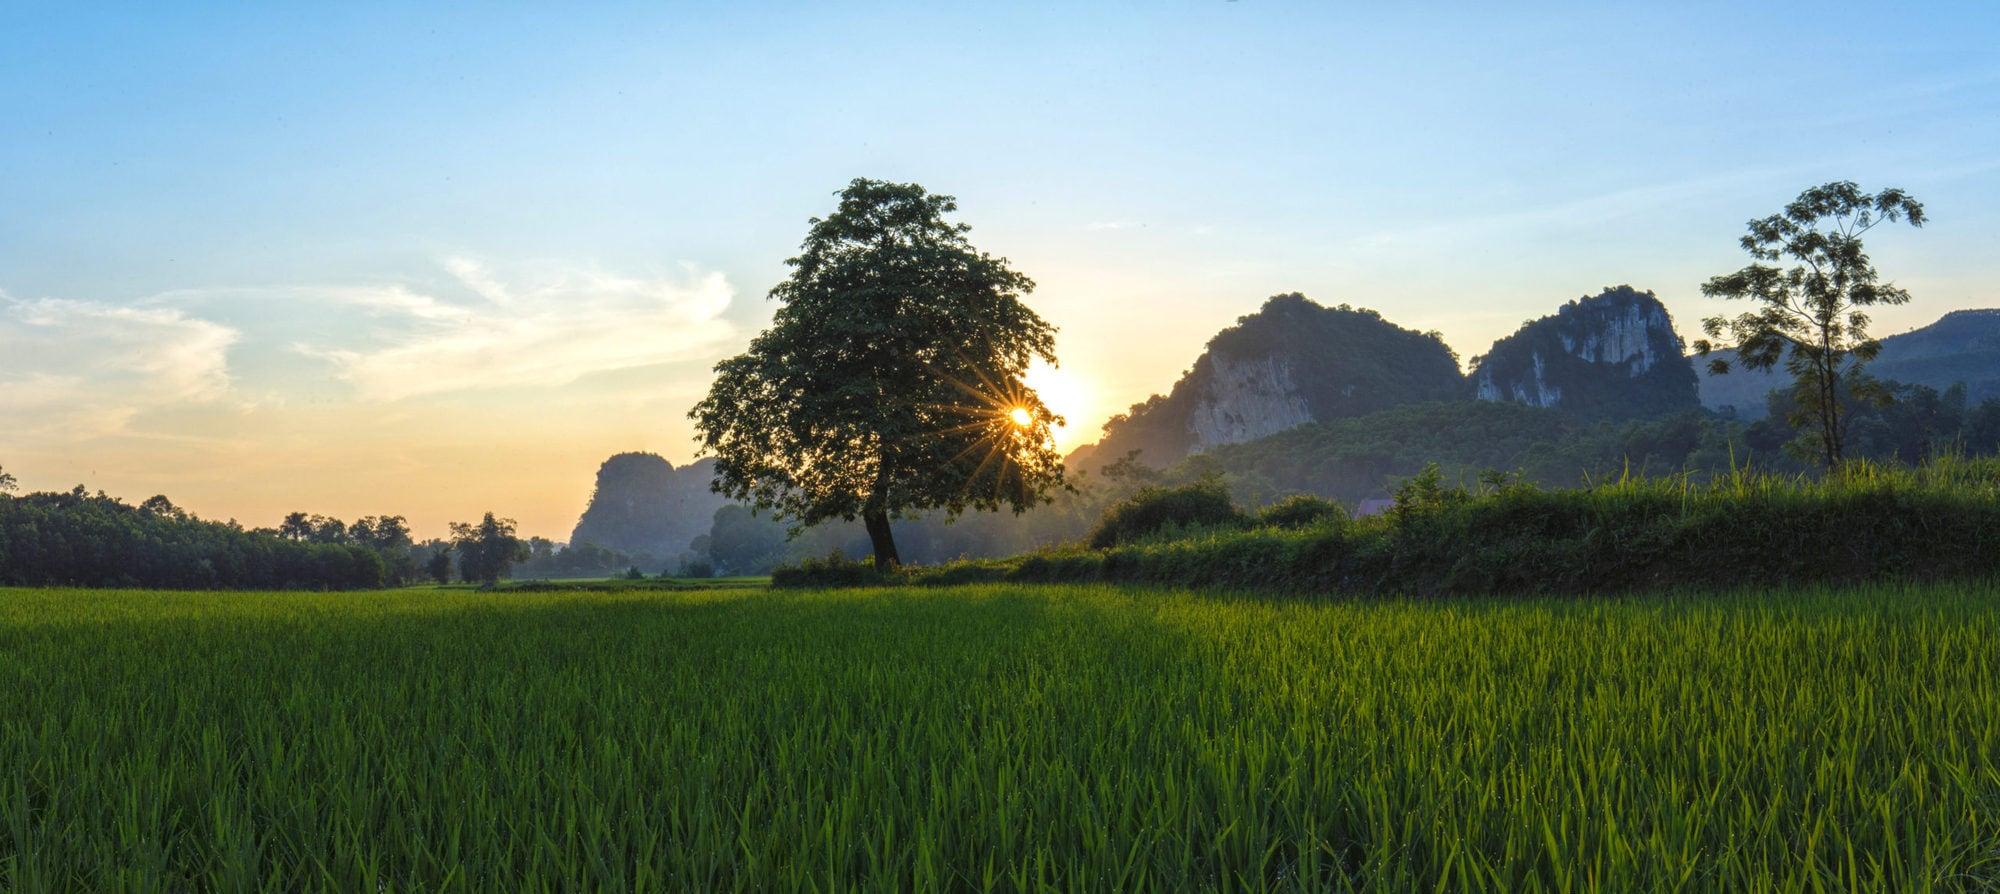 Landscape in Hoa Binh province, northwest of Vietnam (photo credit: ILRI/Vu Ngoc Dung)